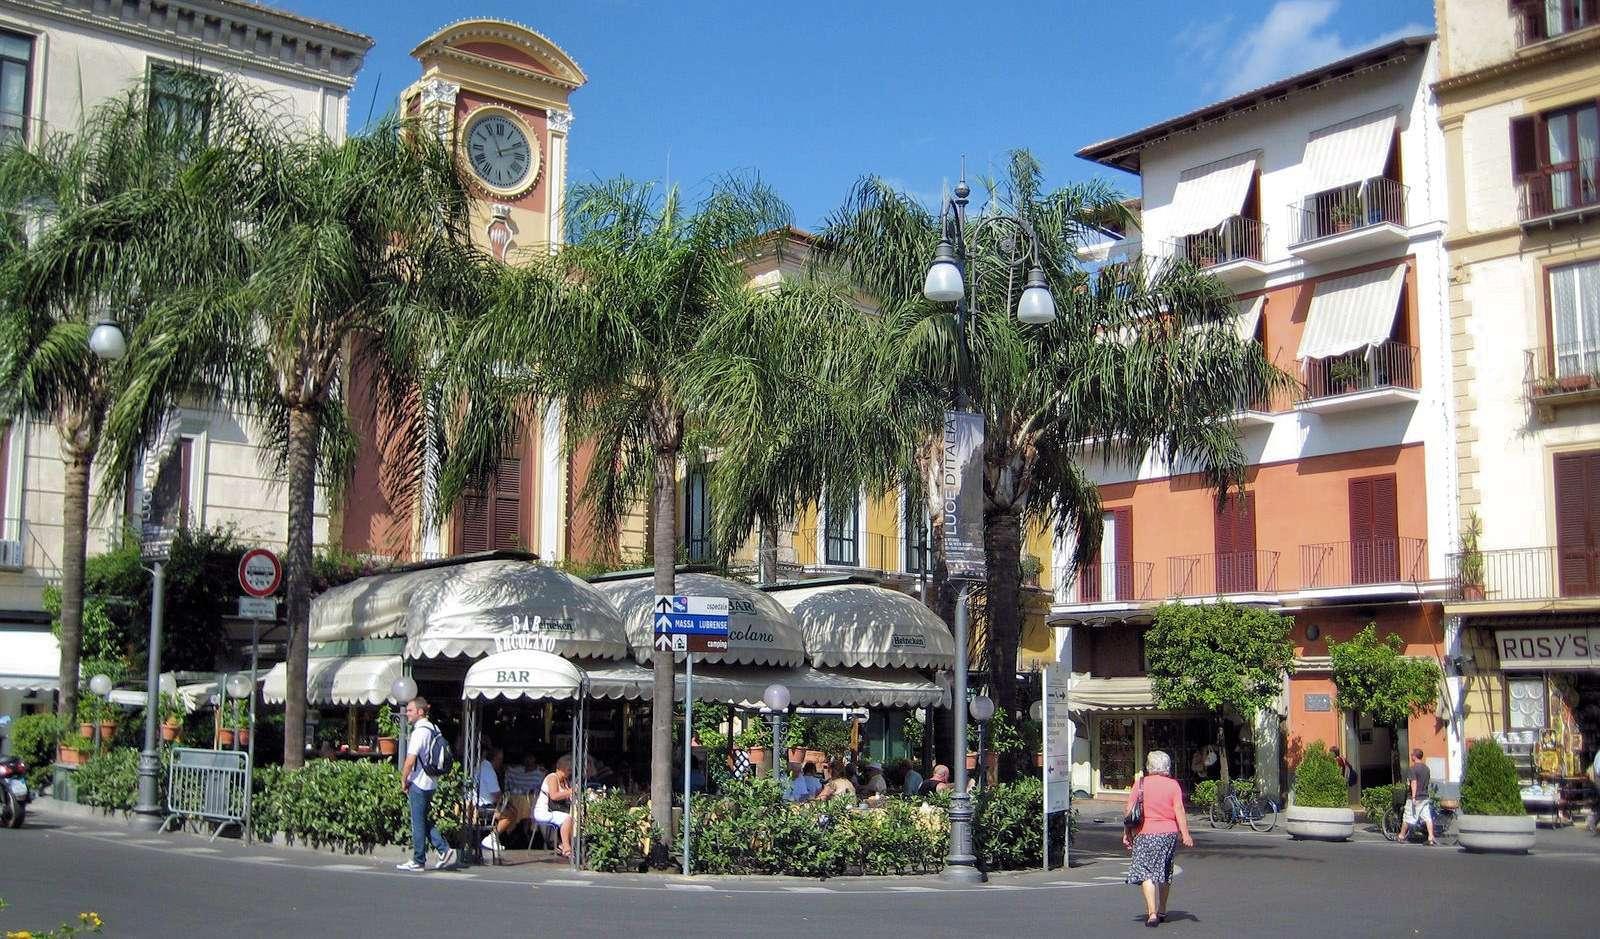 Det centrala torget Piazza Tasso